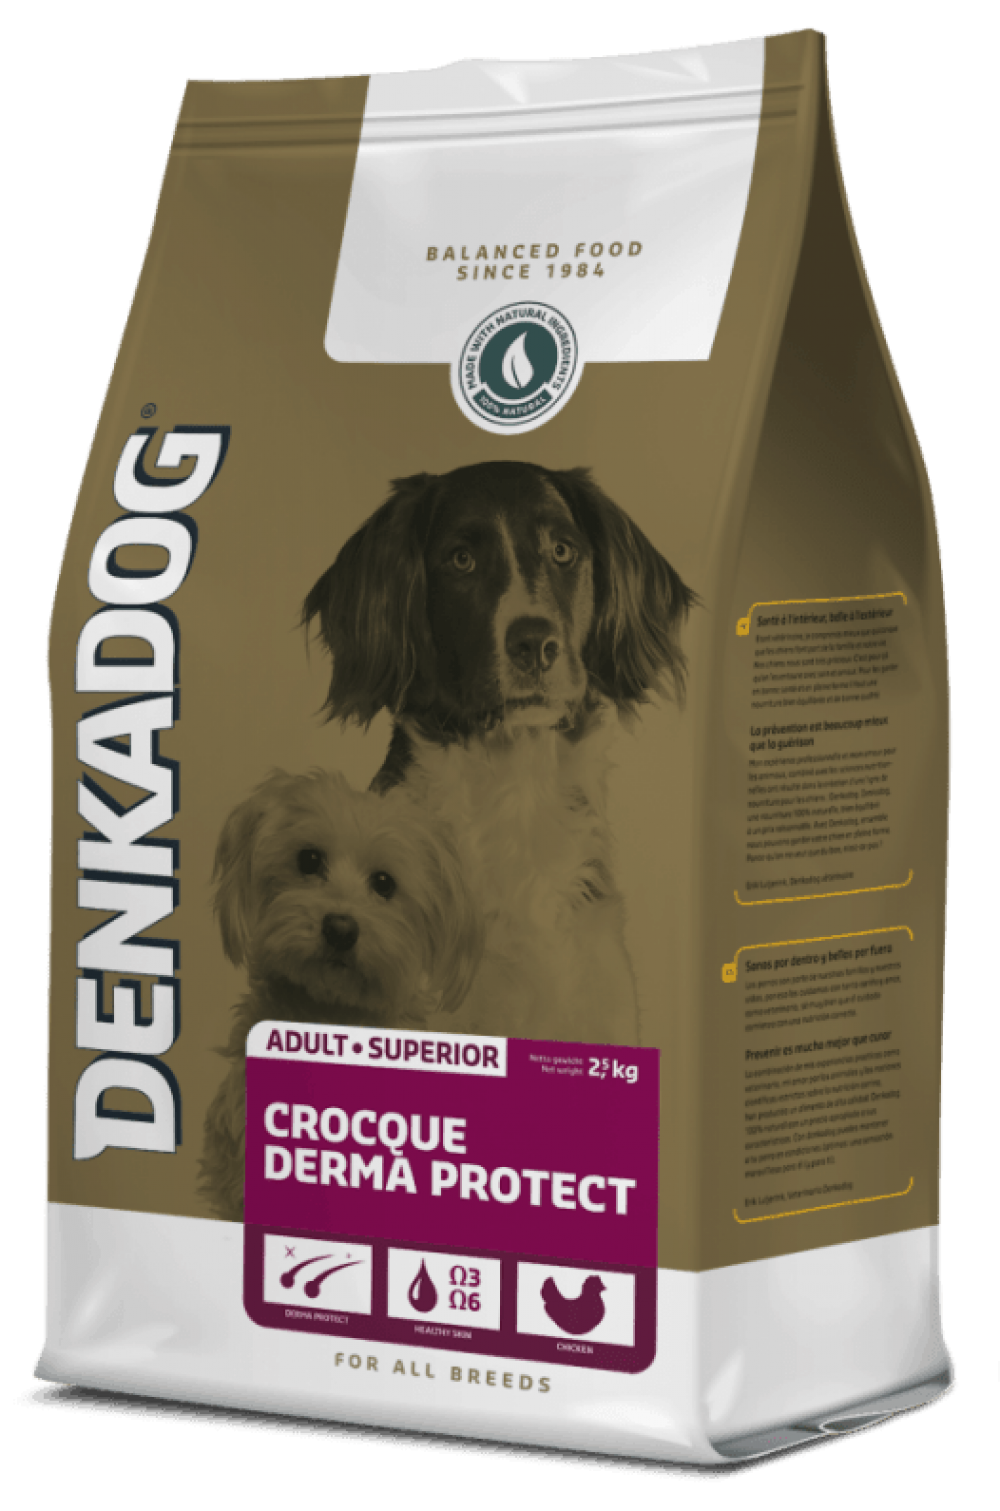 Denkadog Crocque Derma Protect